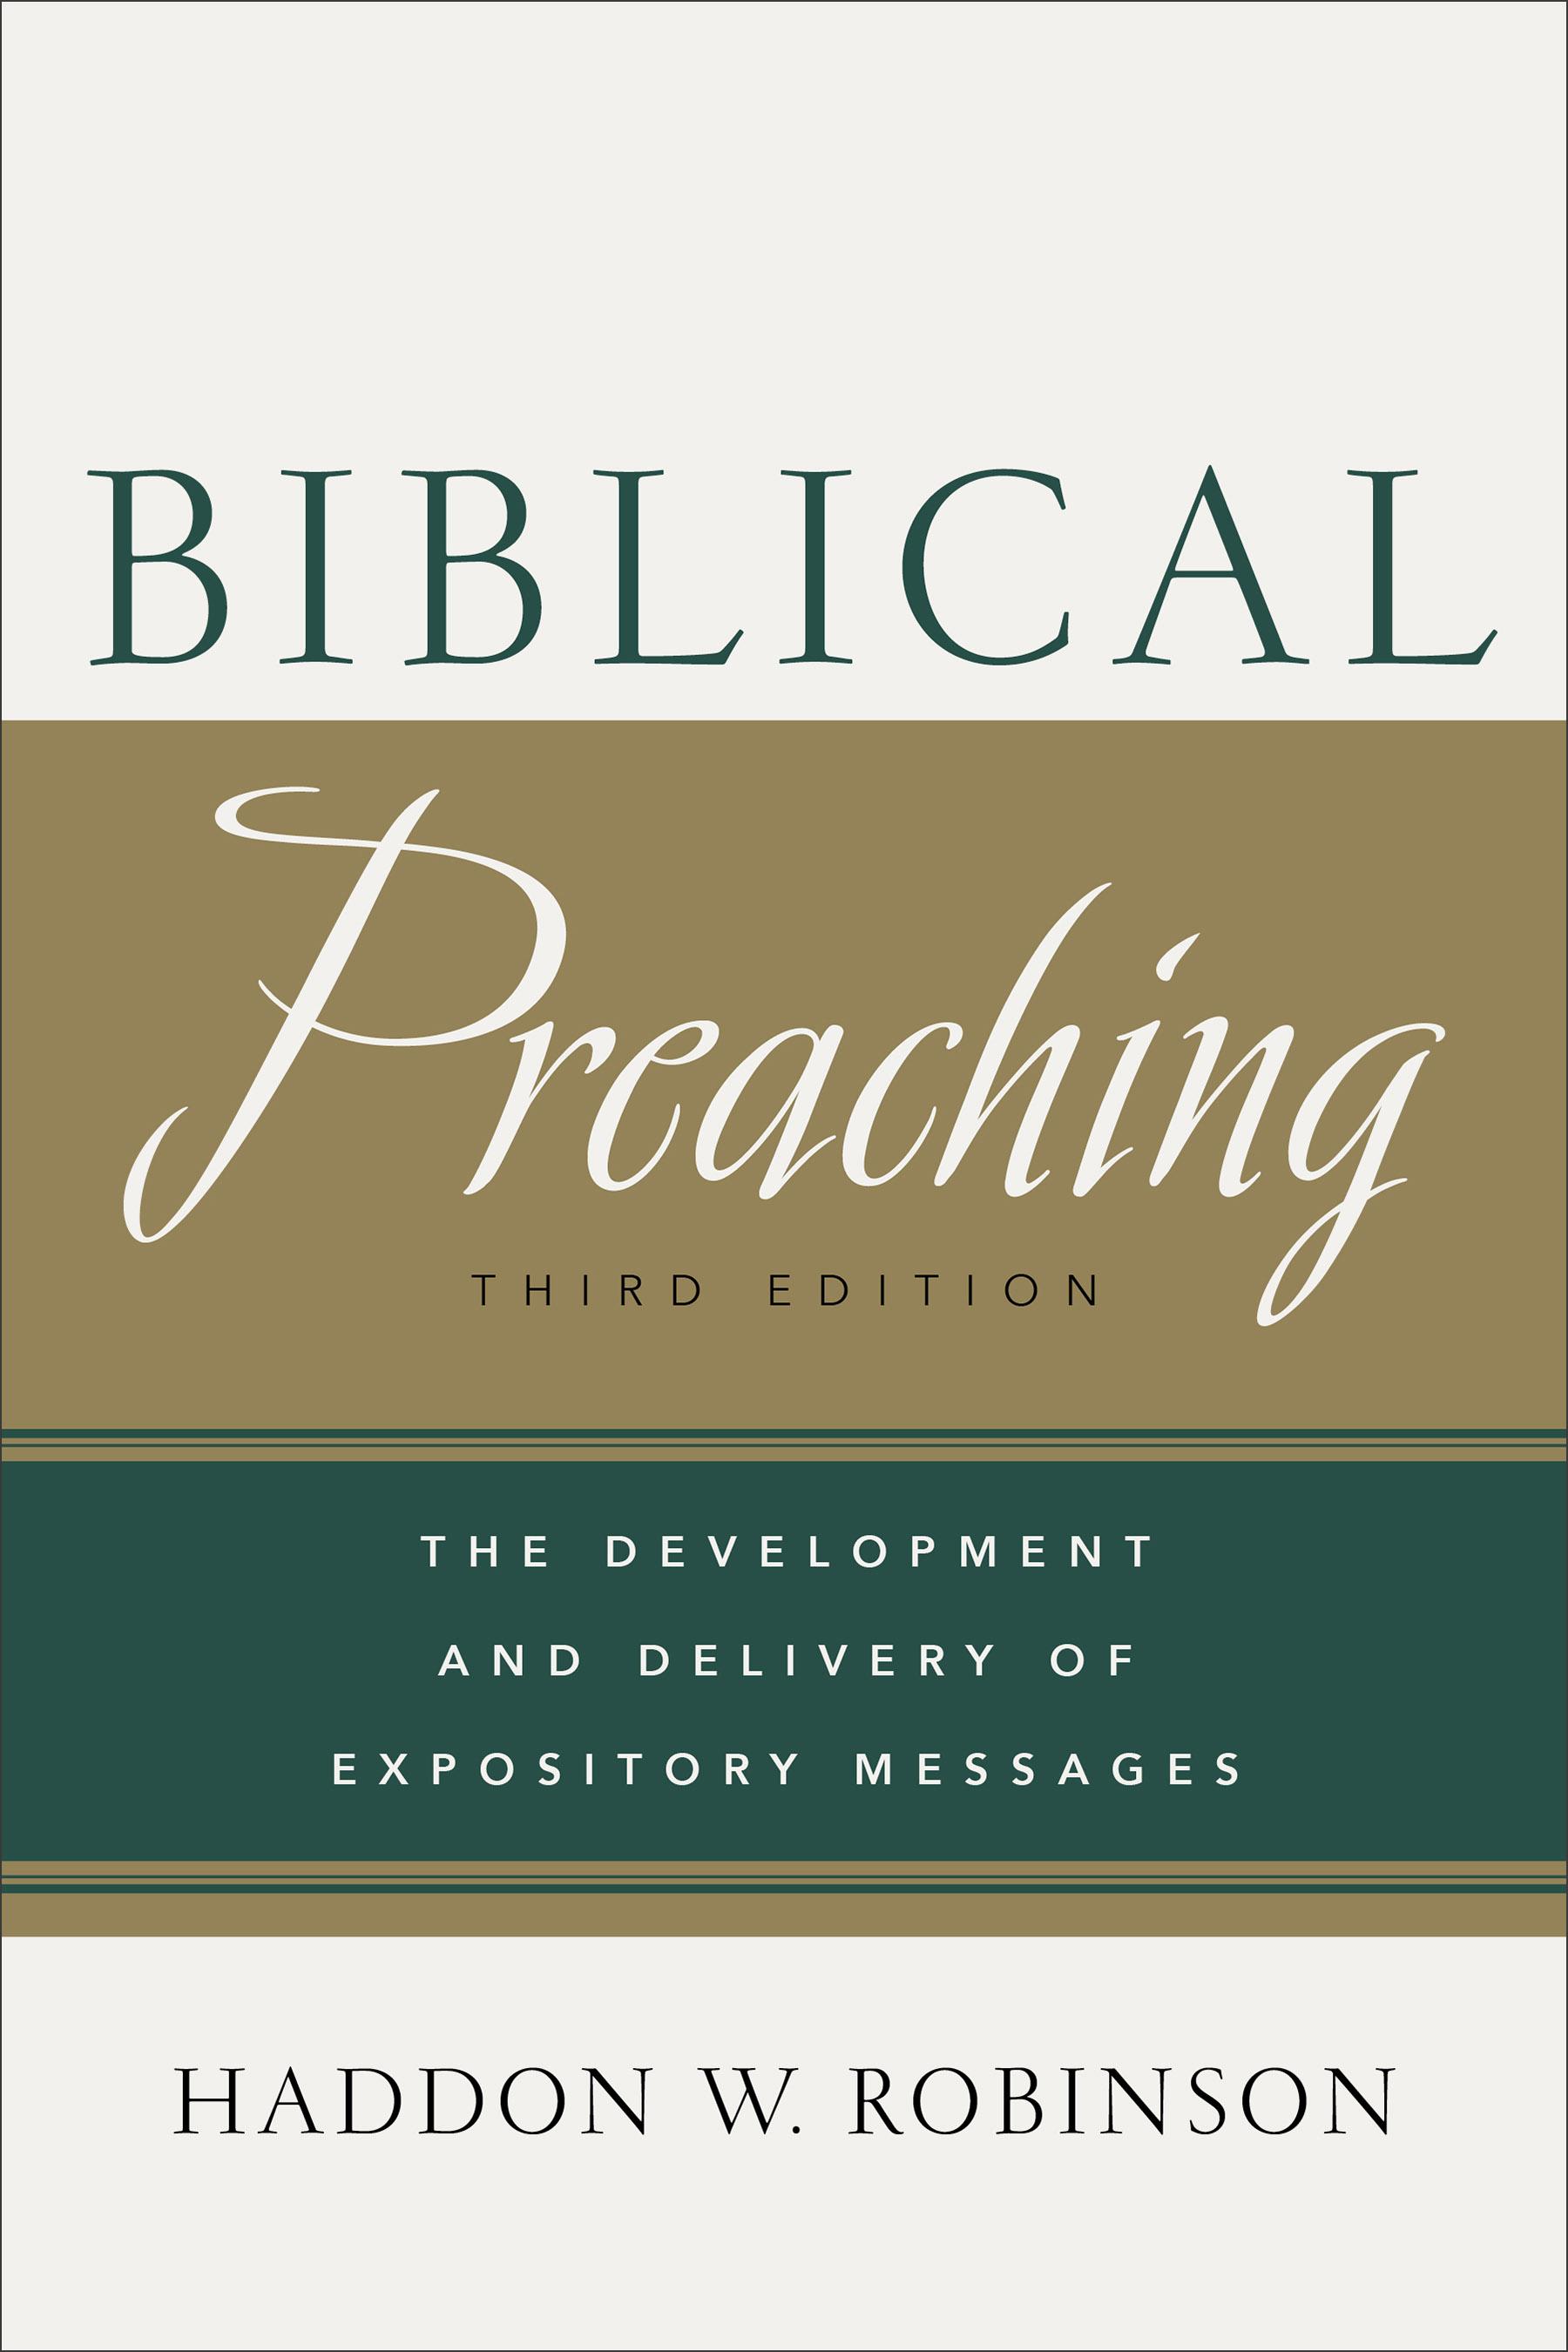 Image result for haddon robinson biblical preaching